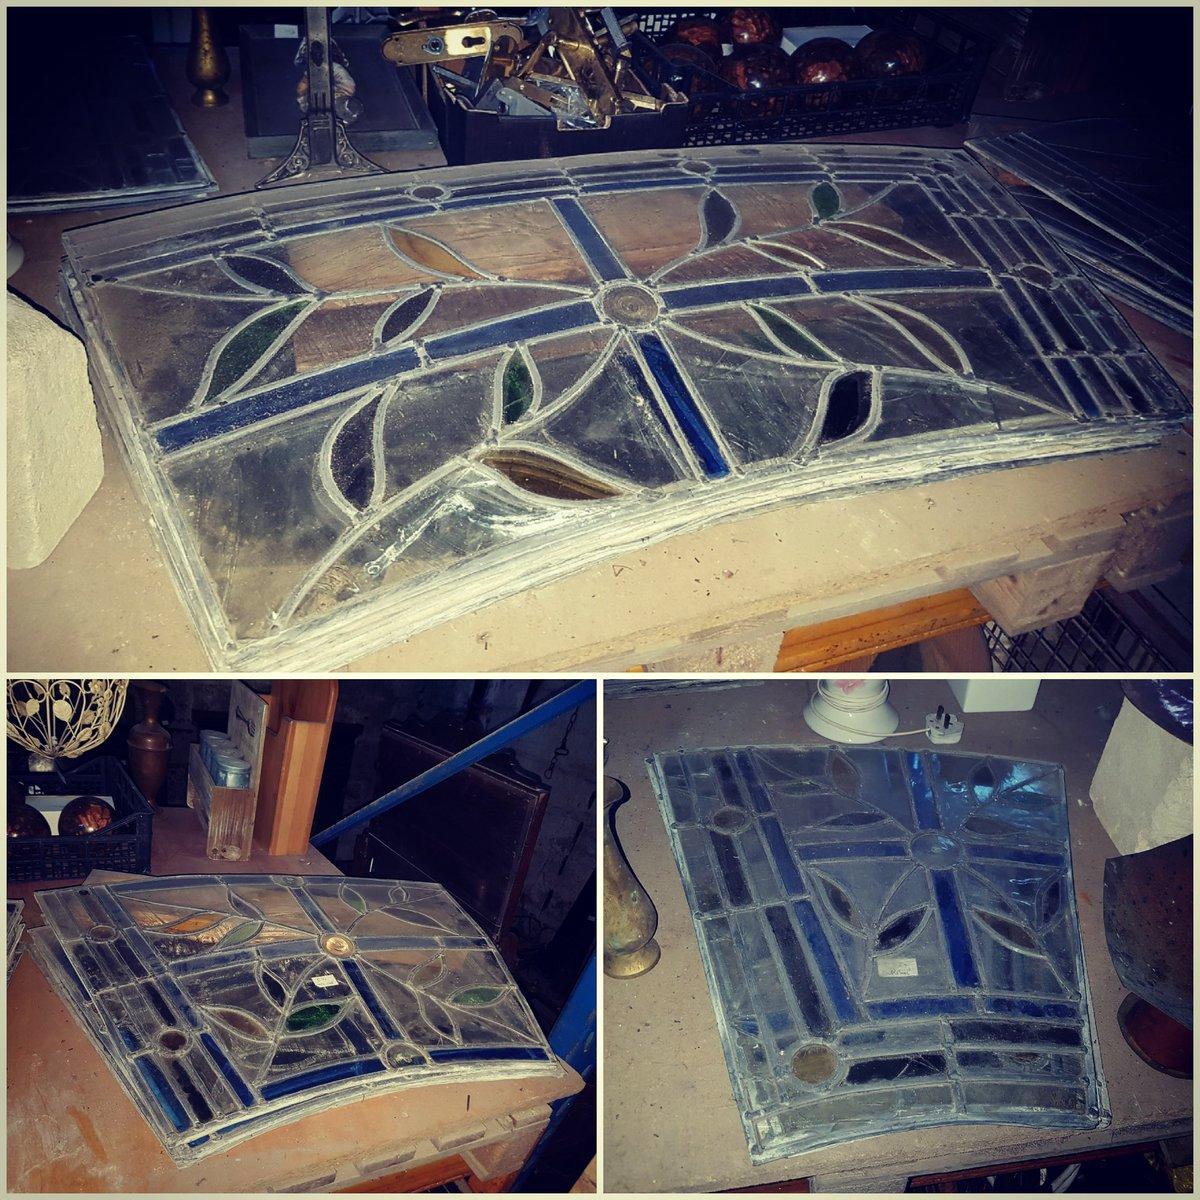 Sheets of stained glass in different sizes available - http://www.eurosalve.com      #kilkennysalvage #antiques #kilkennyarchitecturalsalvage #salvage #kilkenny #glass #glassdisplay #leadedglasswindow #leadedglass #stainedglass #stainedglassart #stainedglasswindow #interiordesignpic.twitter.com/Z3MSyCrMDC